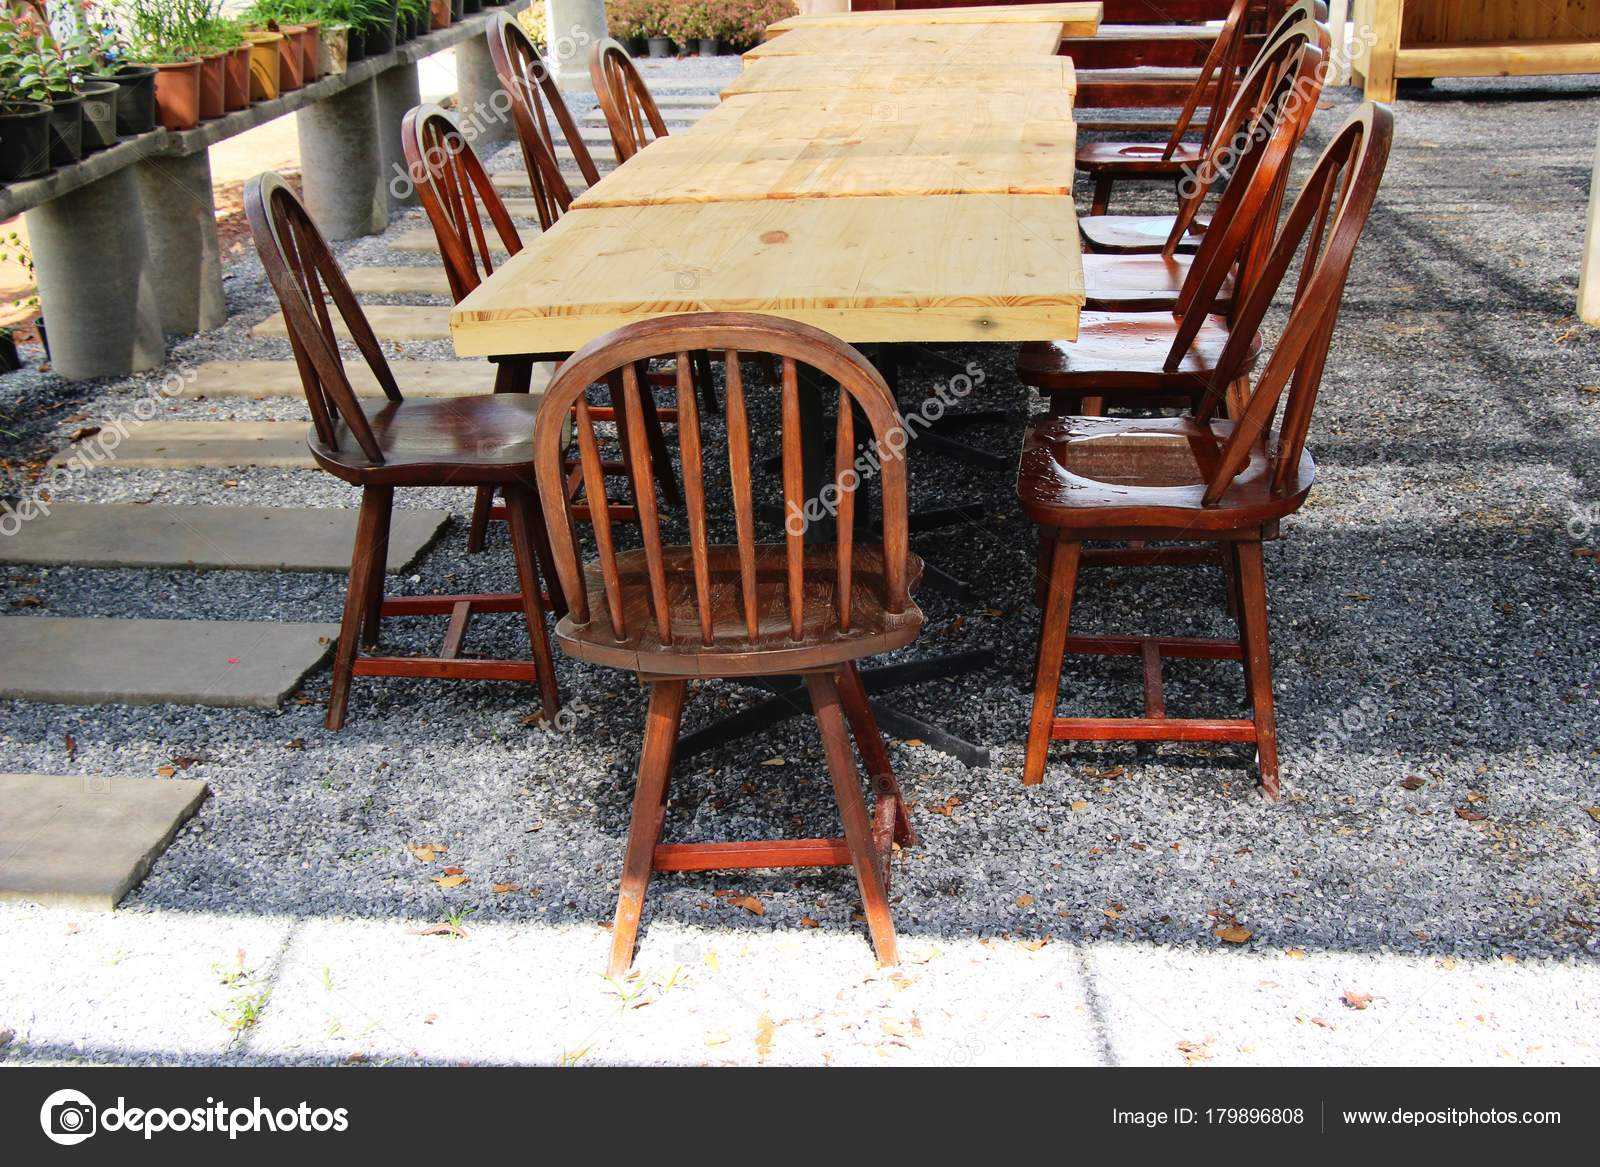 Houten Stoel Tuin : Houten stoelen in de tuin vintage stijl u2014 stockfoto © seagamess